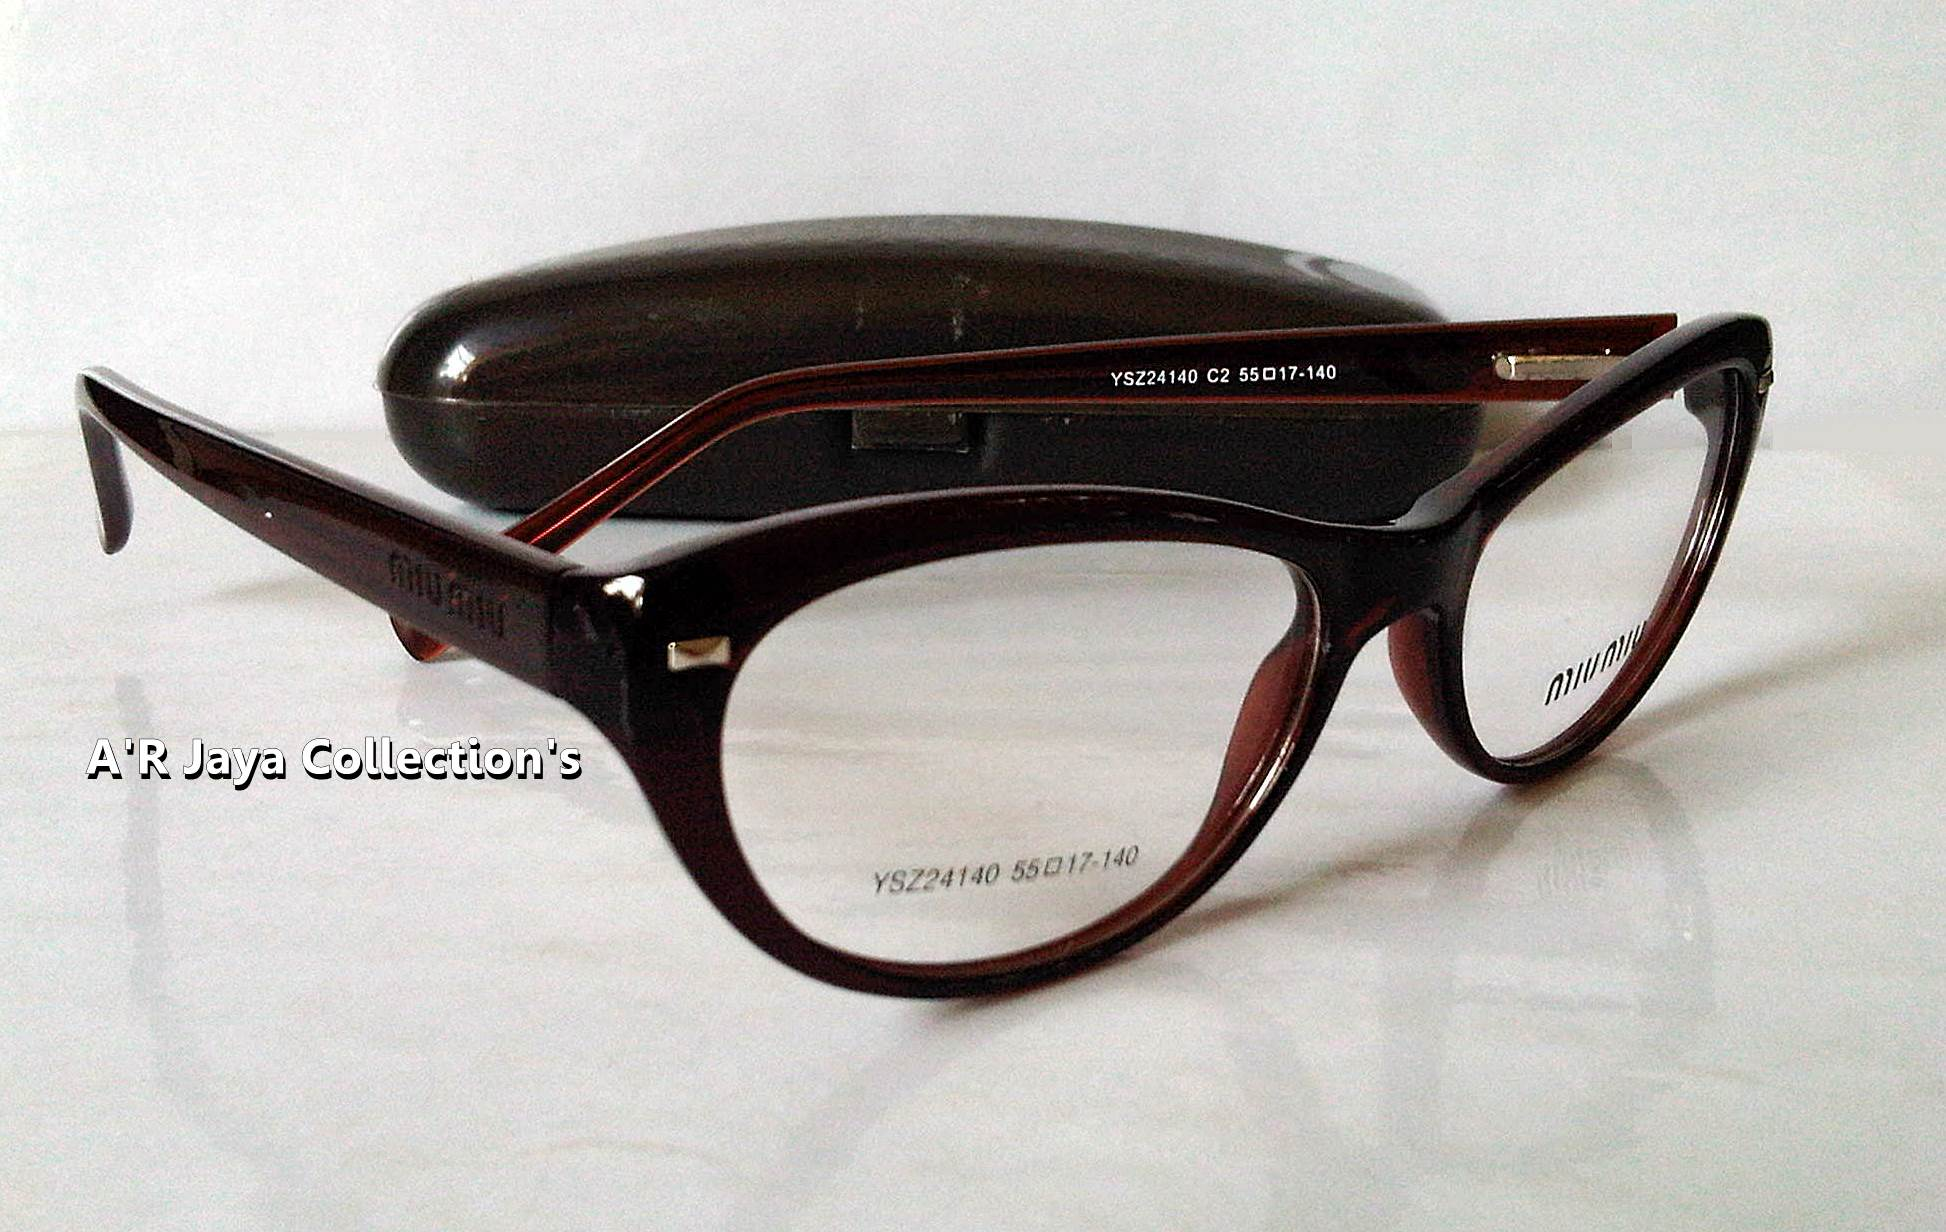 Jual PROMO Frame Kacamata ( Miu-Miu Cat Eyes ) + Lensa Minus... - A R Jaya  Olshop  b7abb7978a